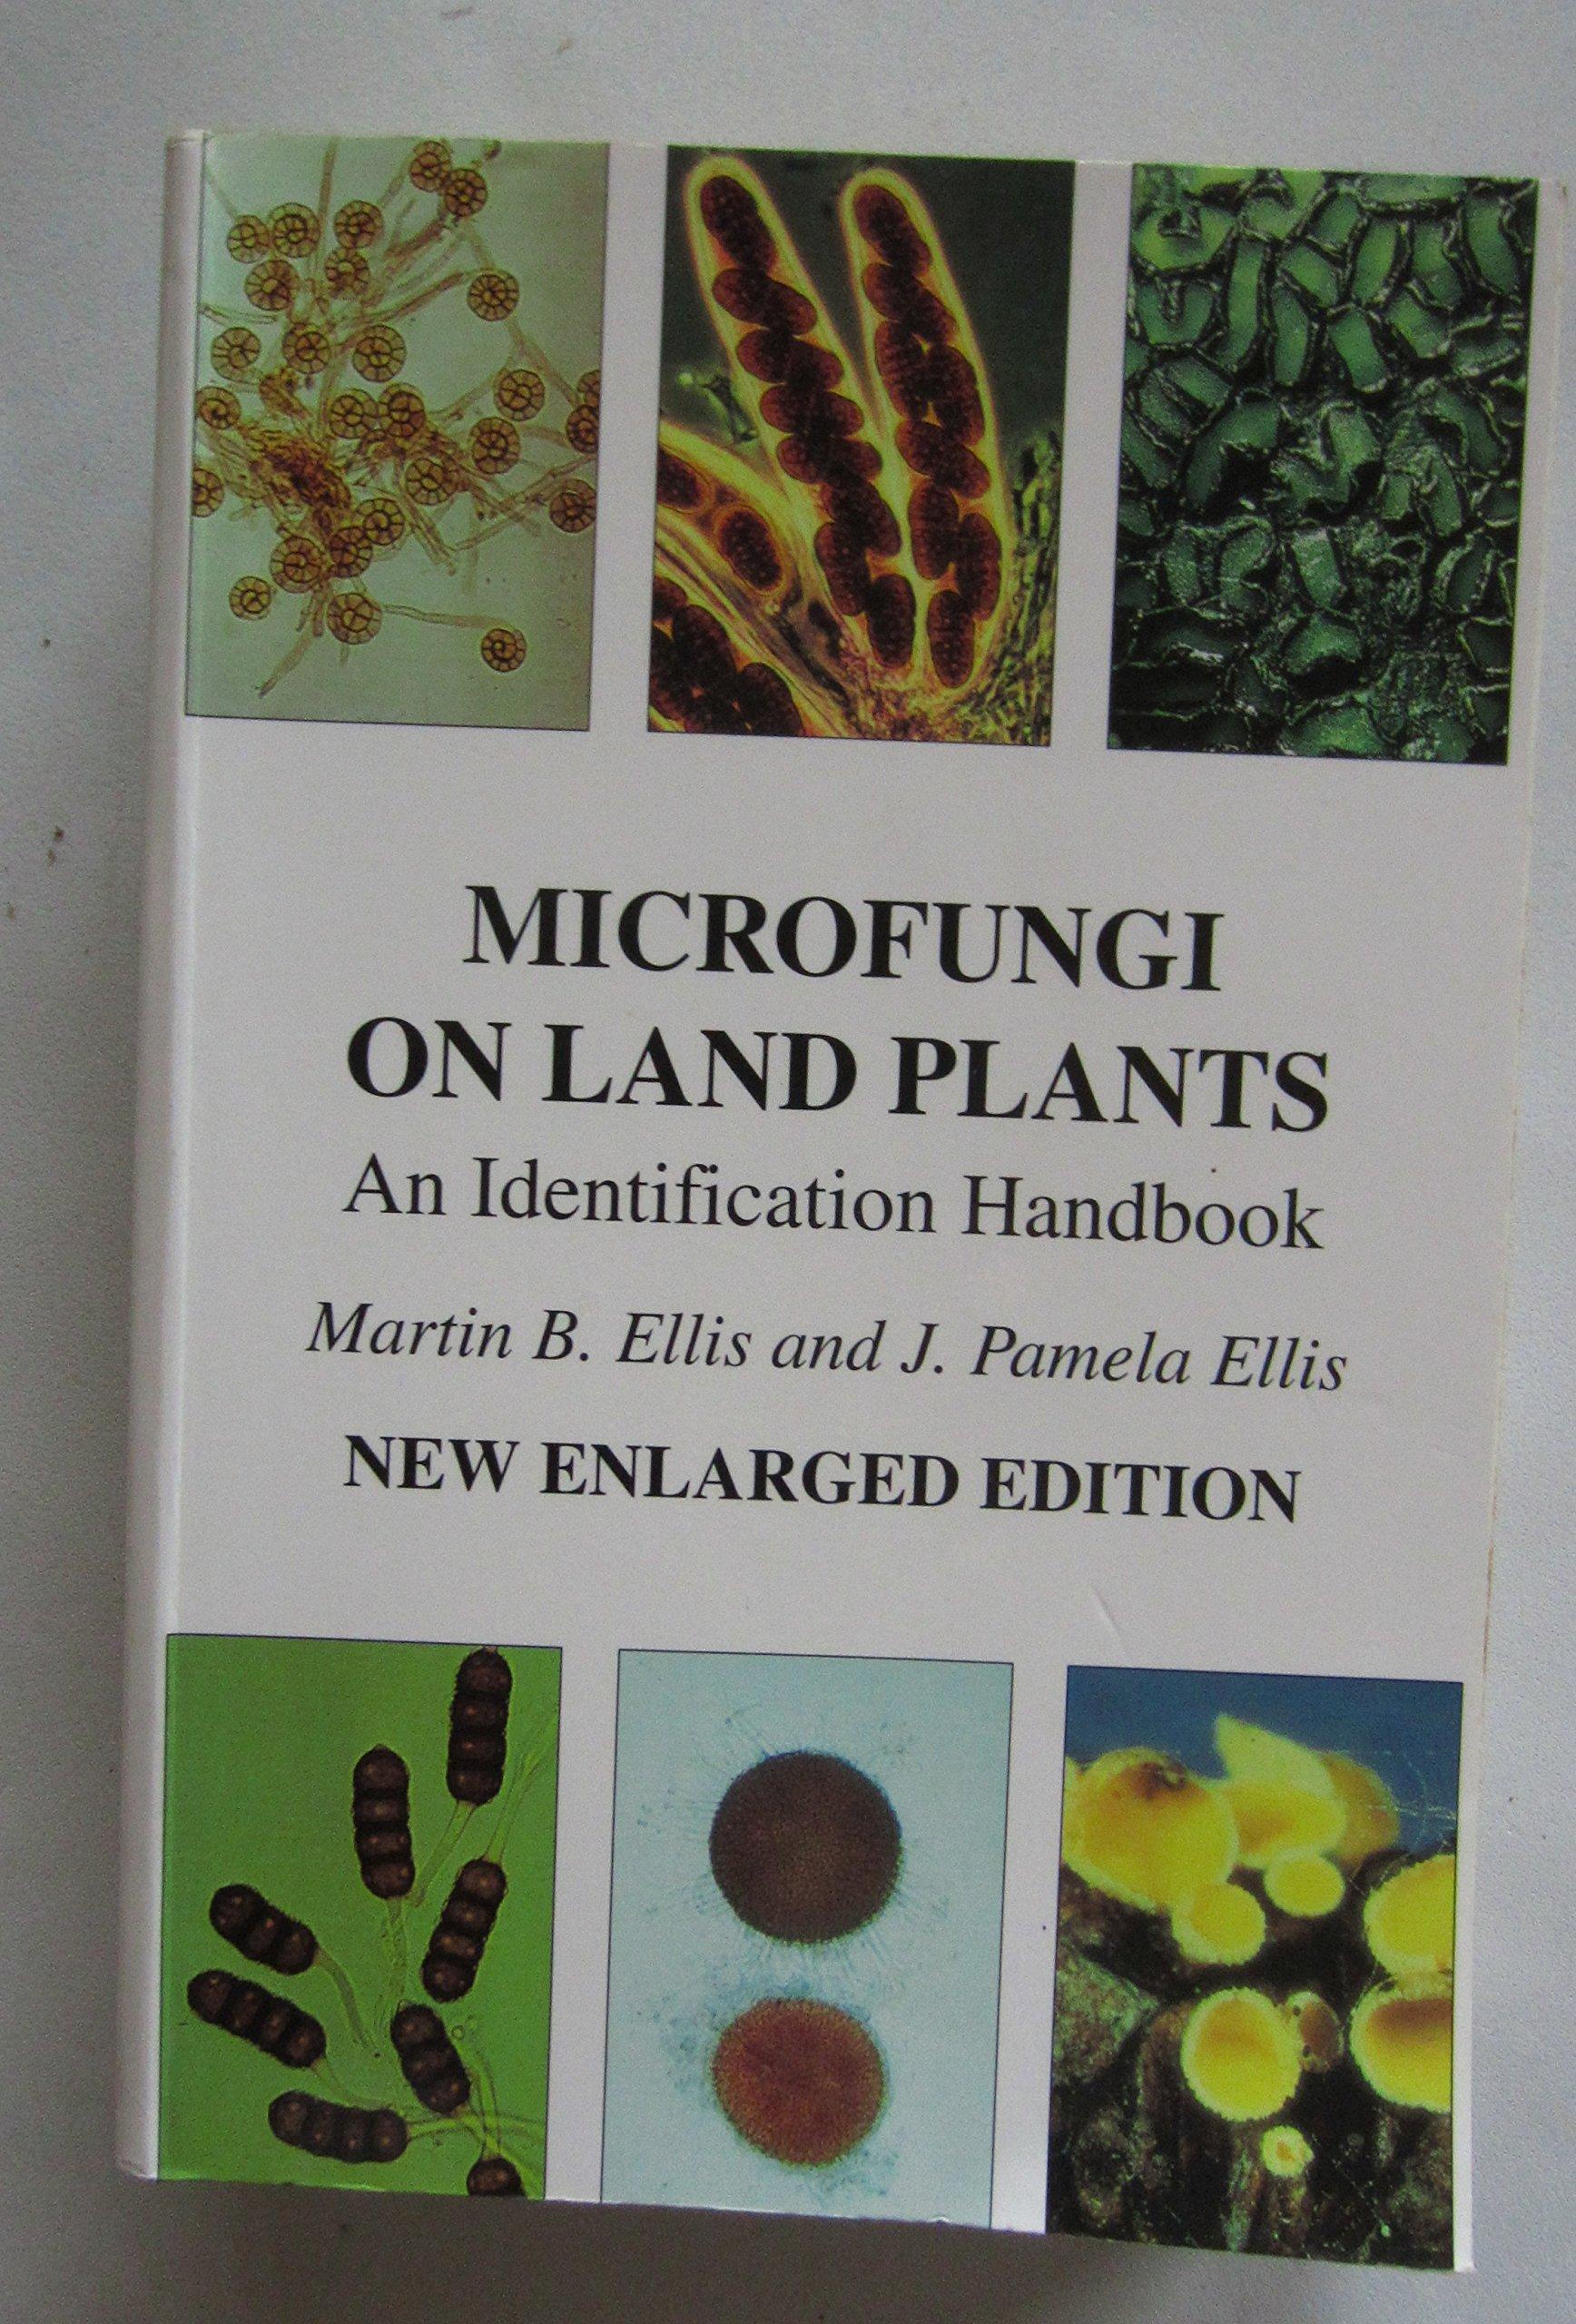 Microfungi on Land Plants: An Identification Handbook